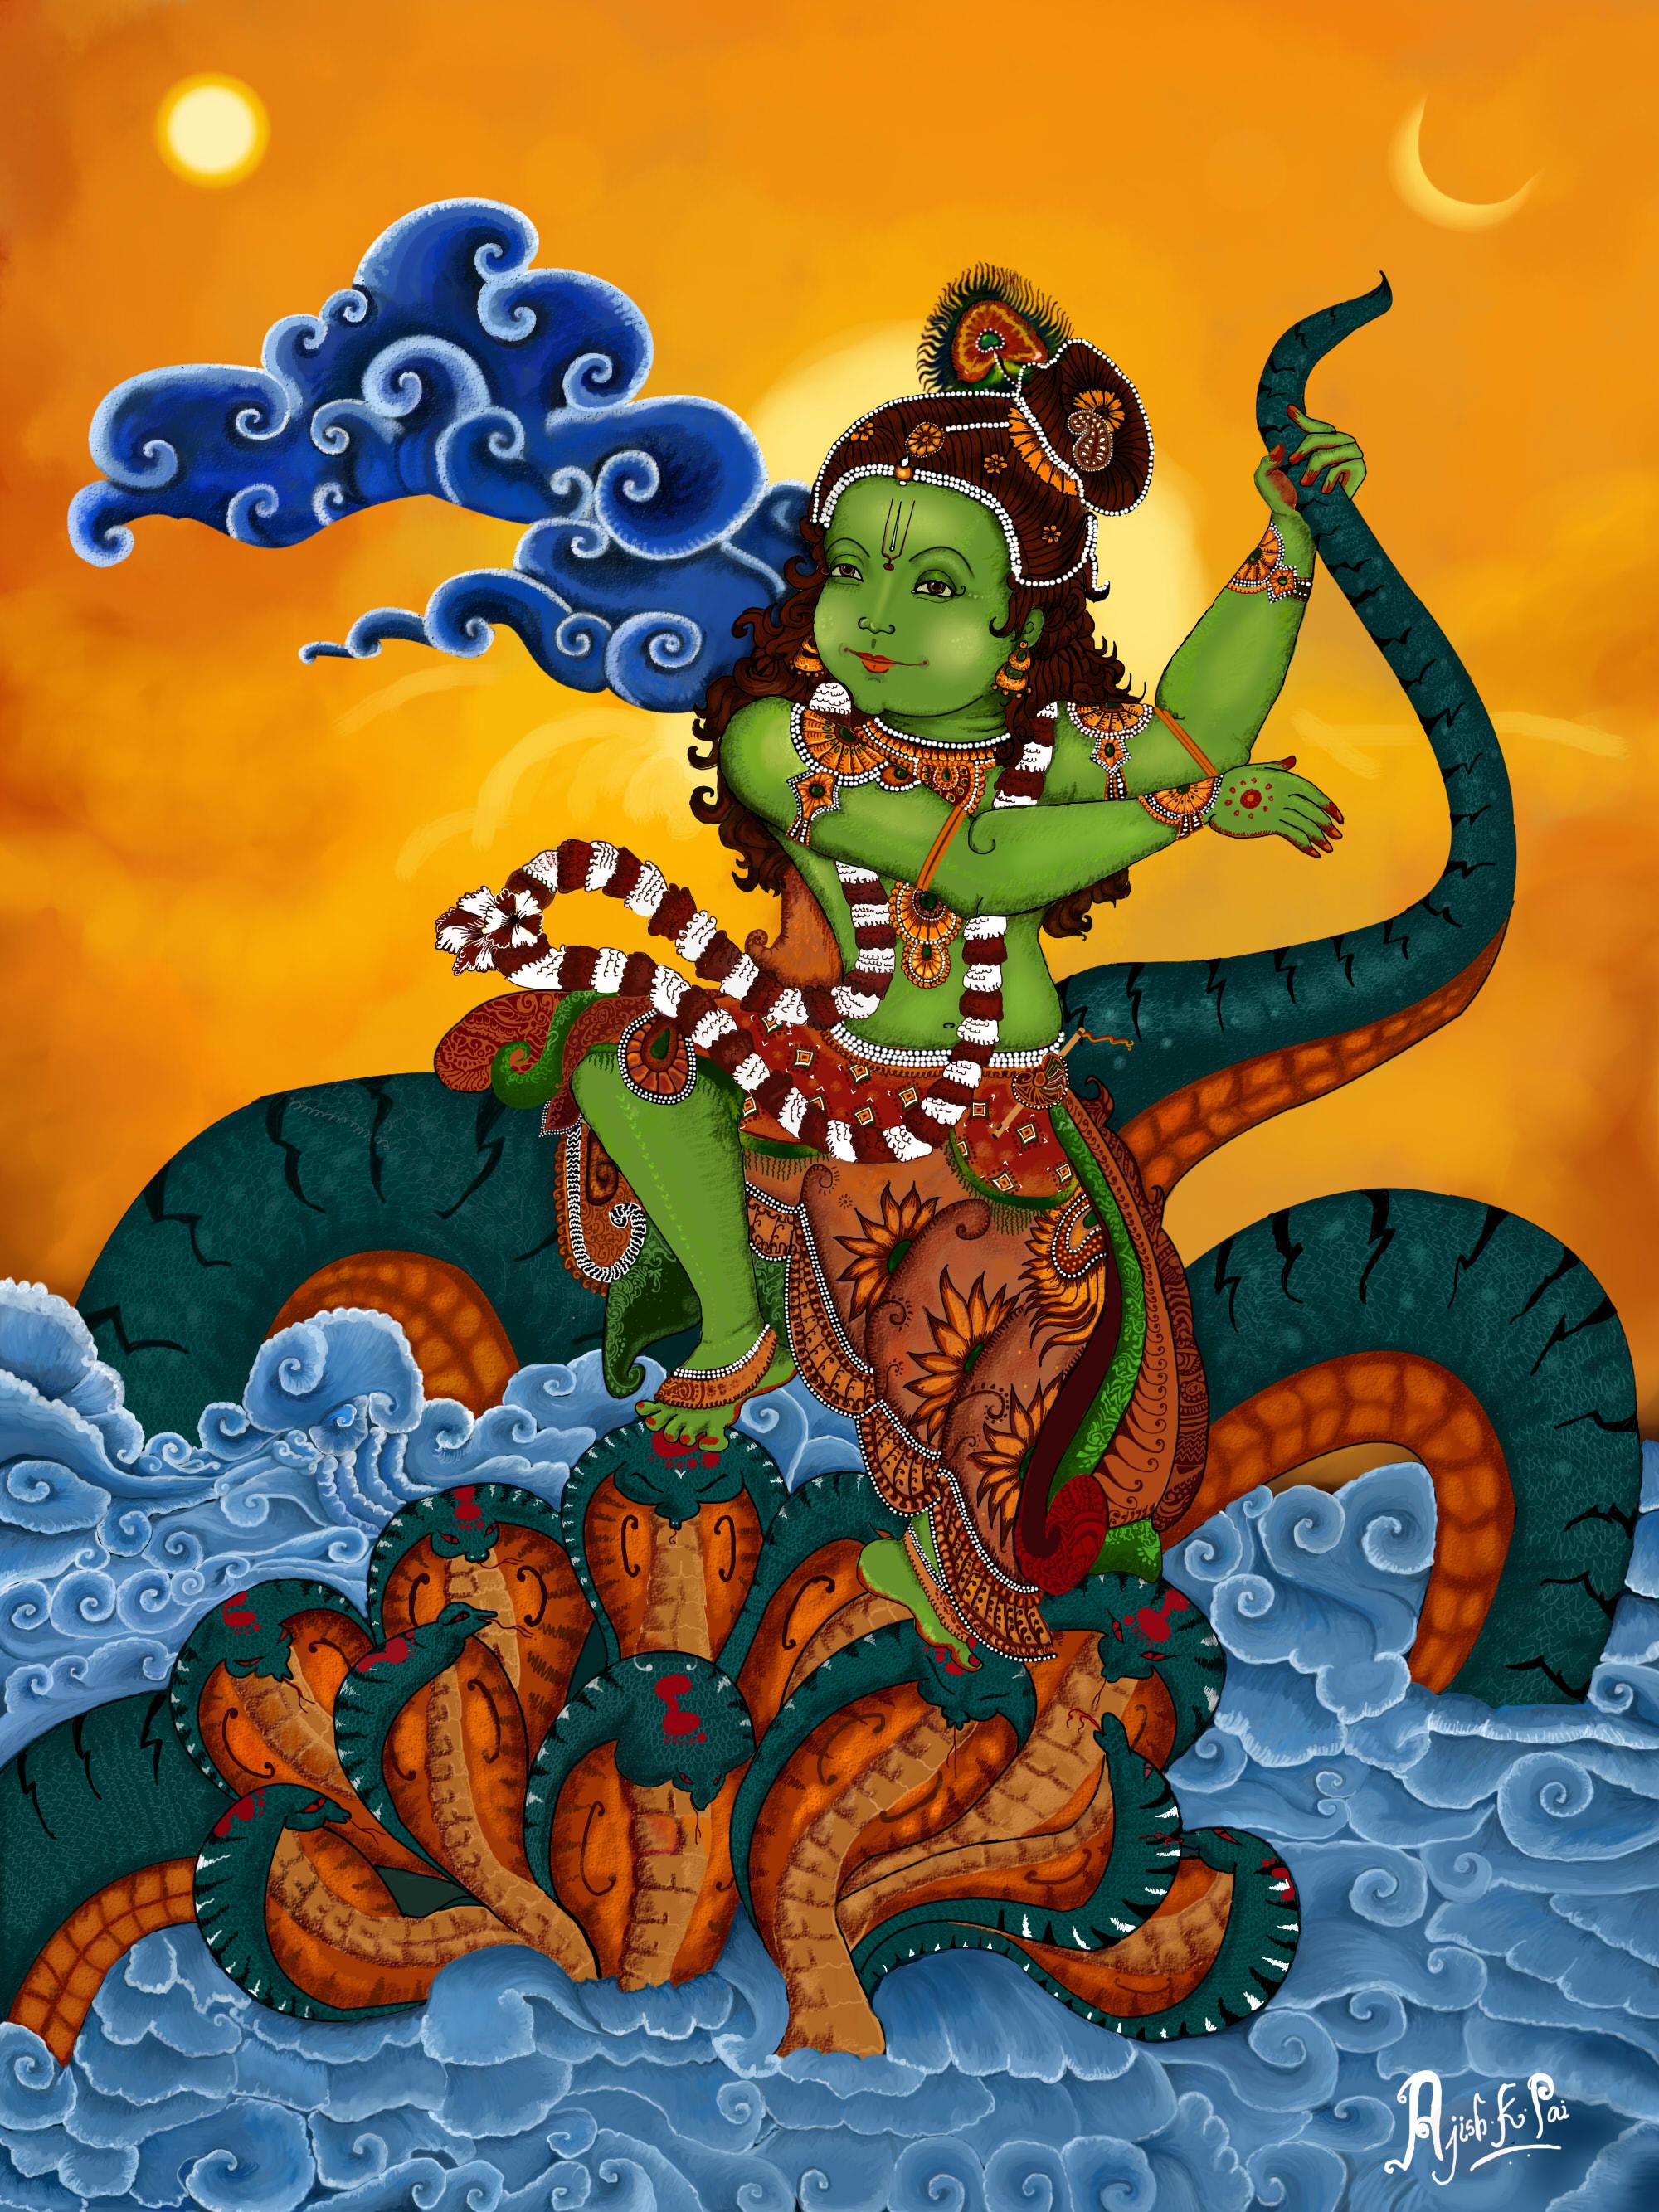 Bhagwan Krishna Black Snake Photo Gallery for free download